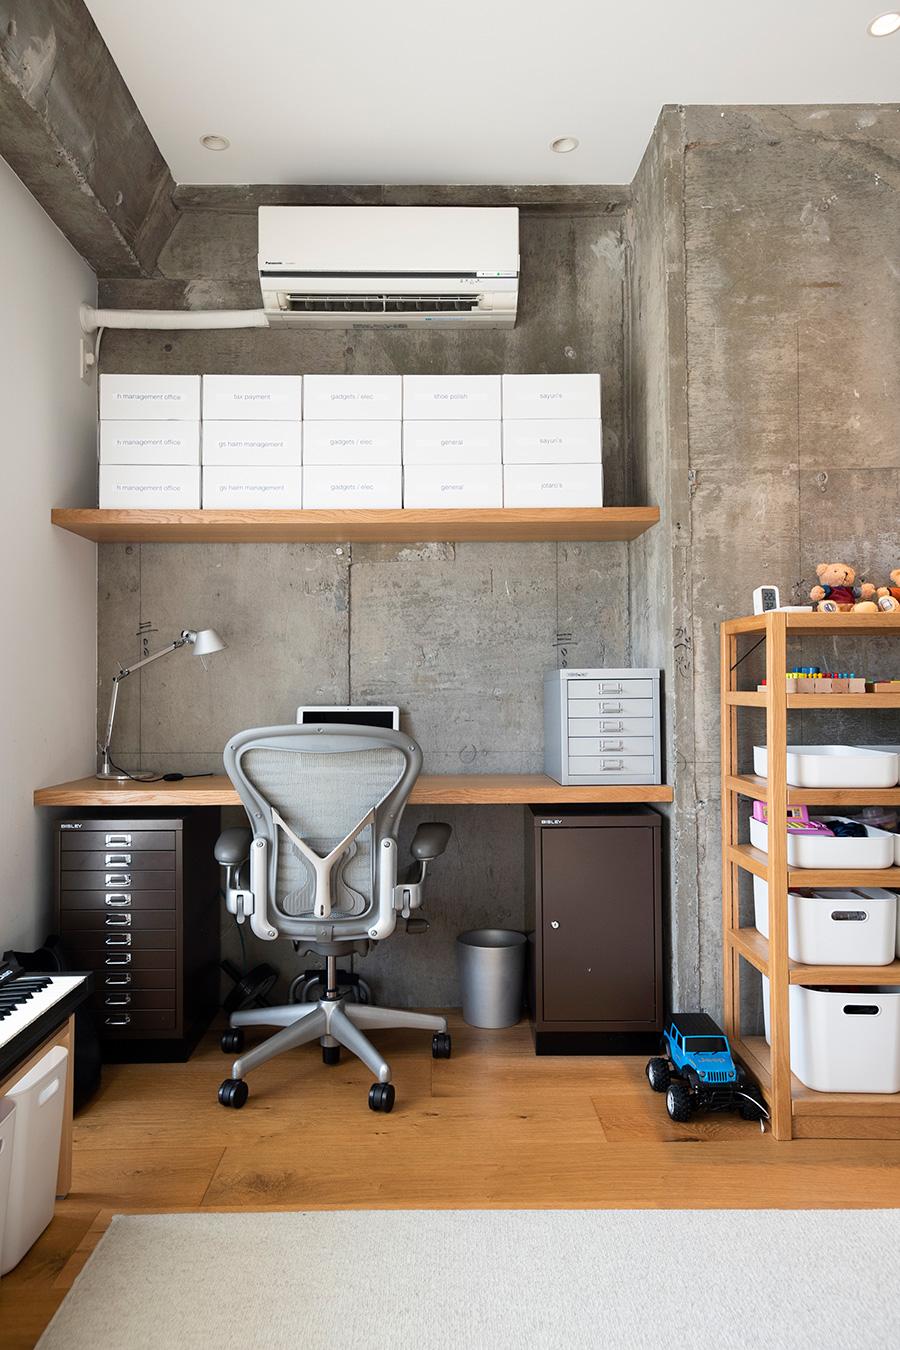 BISLEYのキャビネットが収まる高さに、棚板を渡して机を造作。